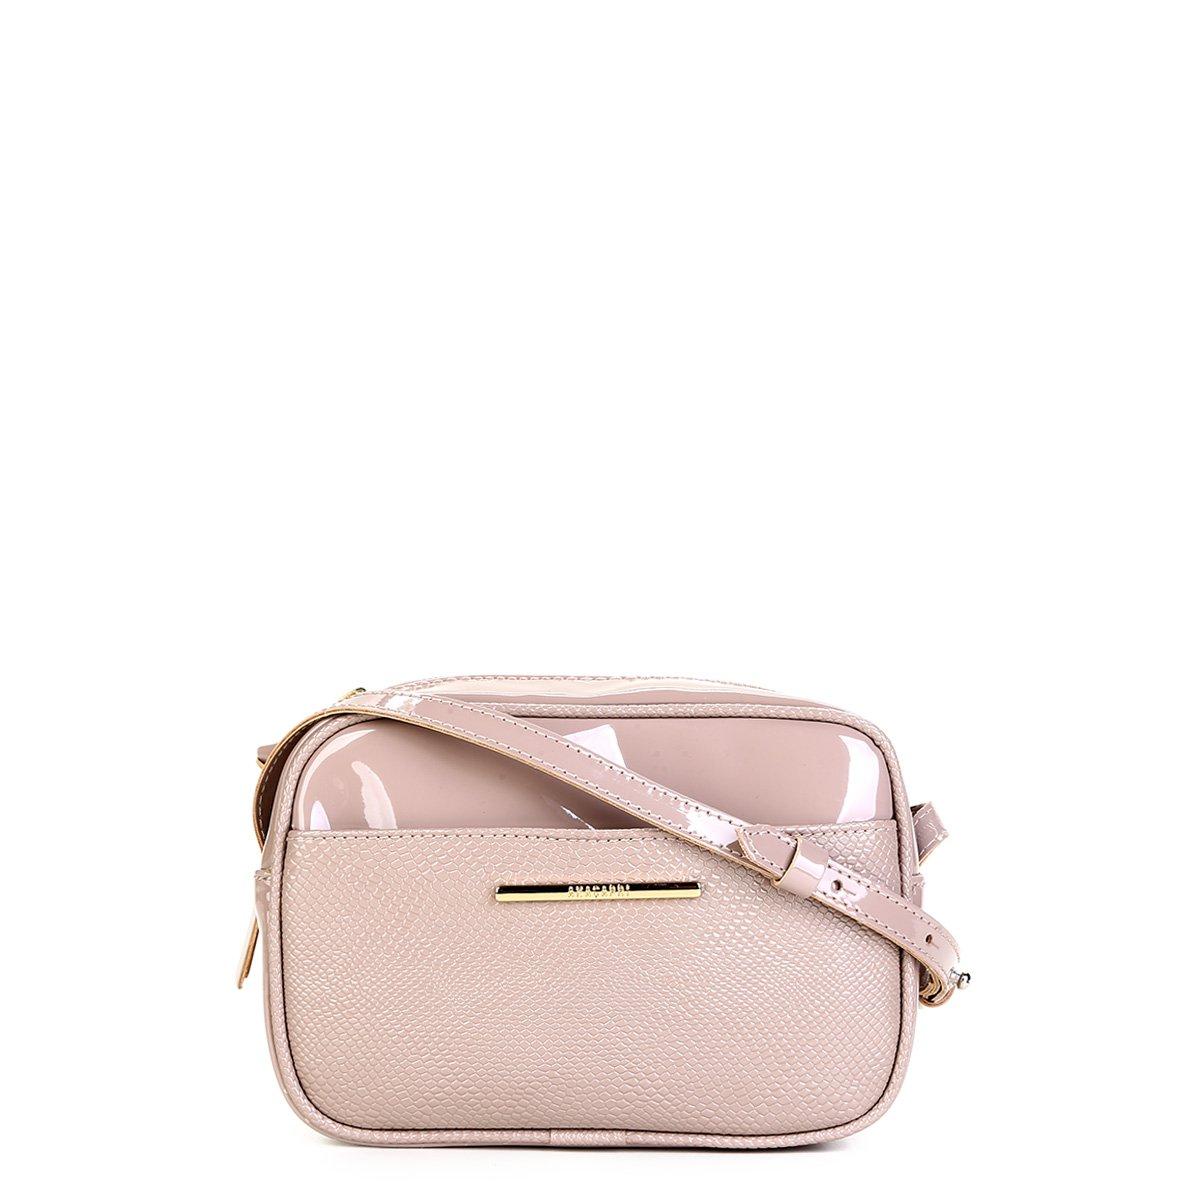 7e6b1a2ac Bolsa Anacapri Corin Mini Bag Transversal Feminina